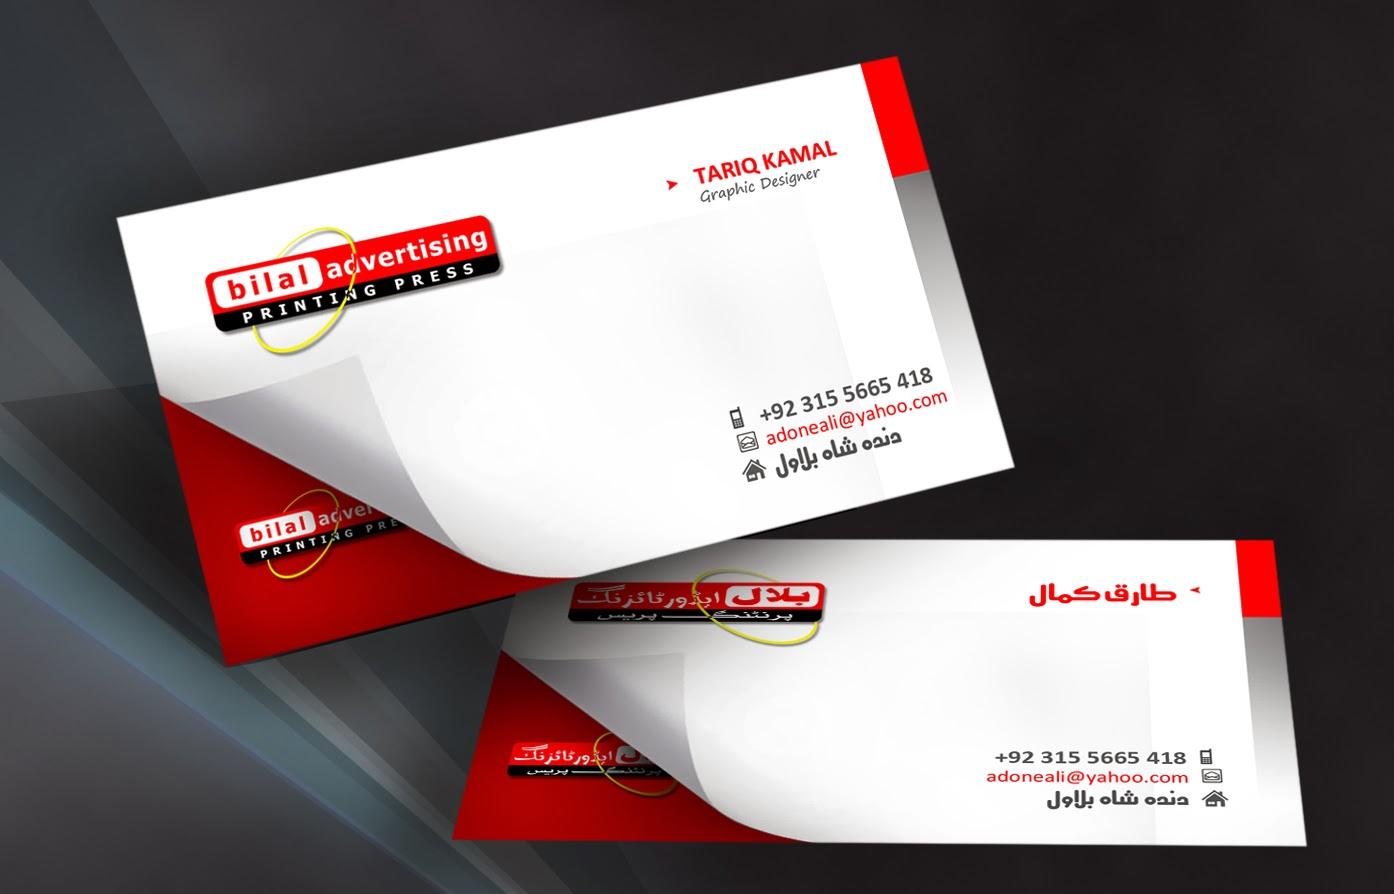 Bilal Printing Press Card Design